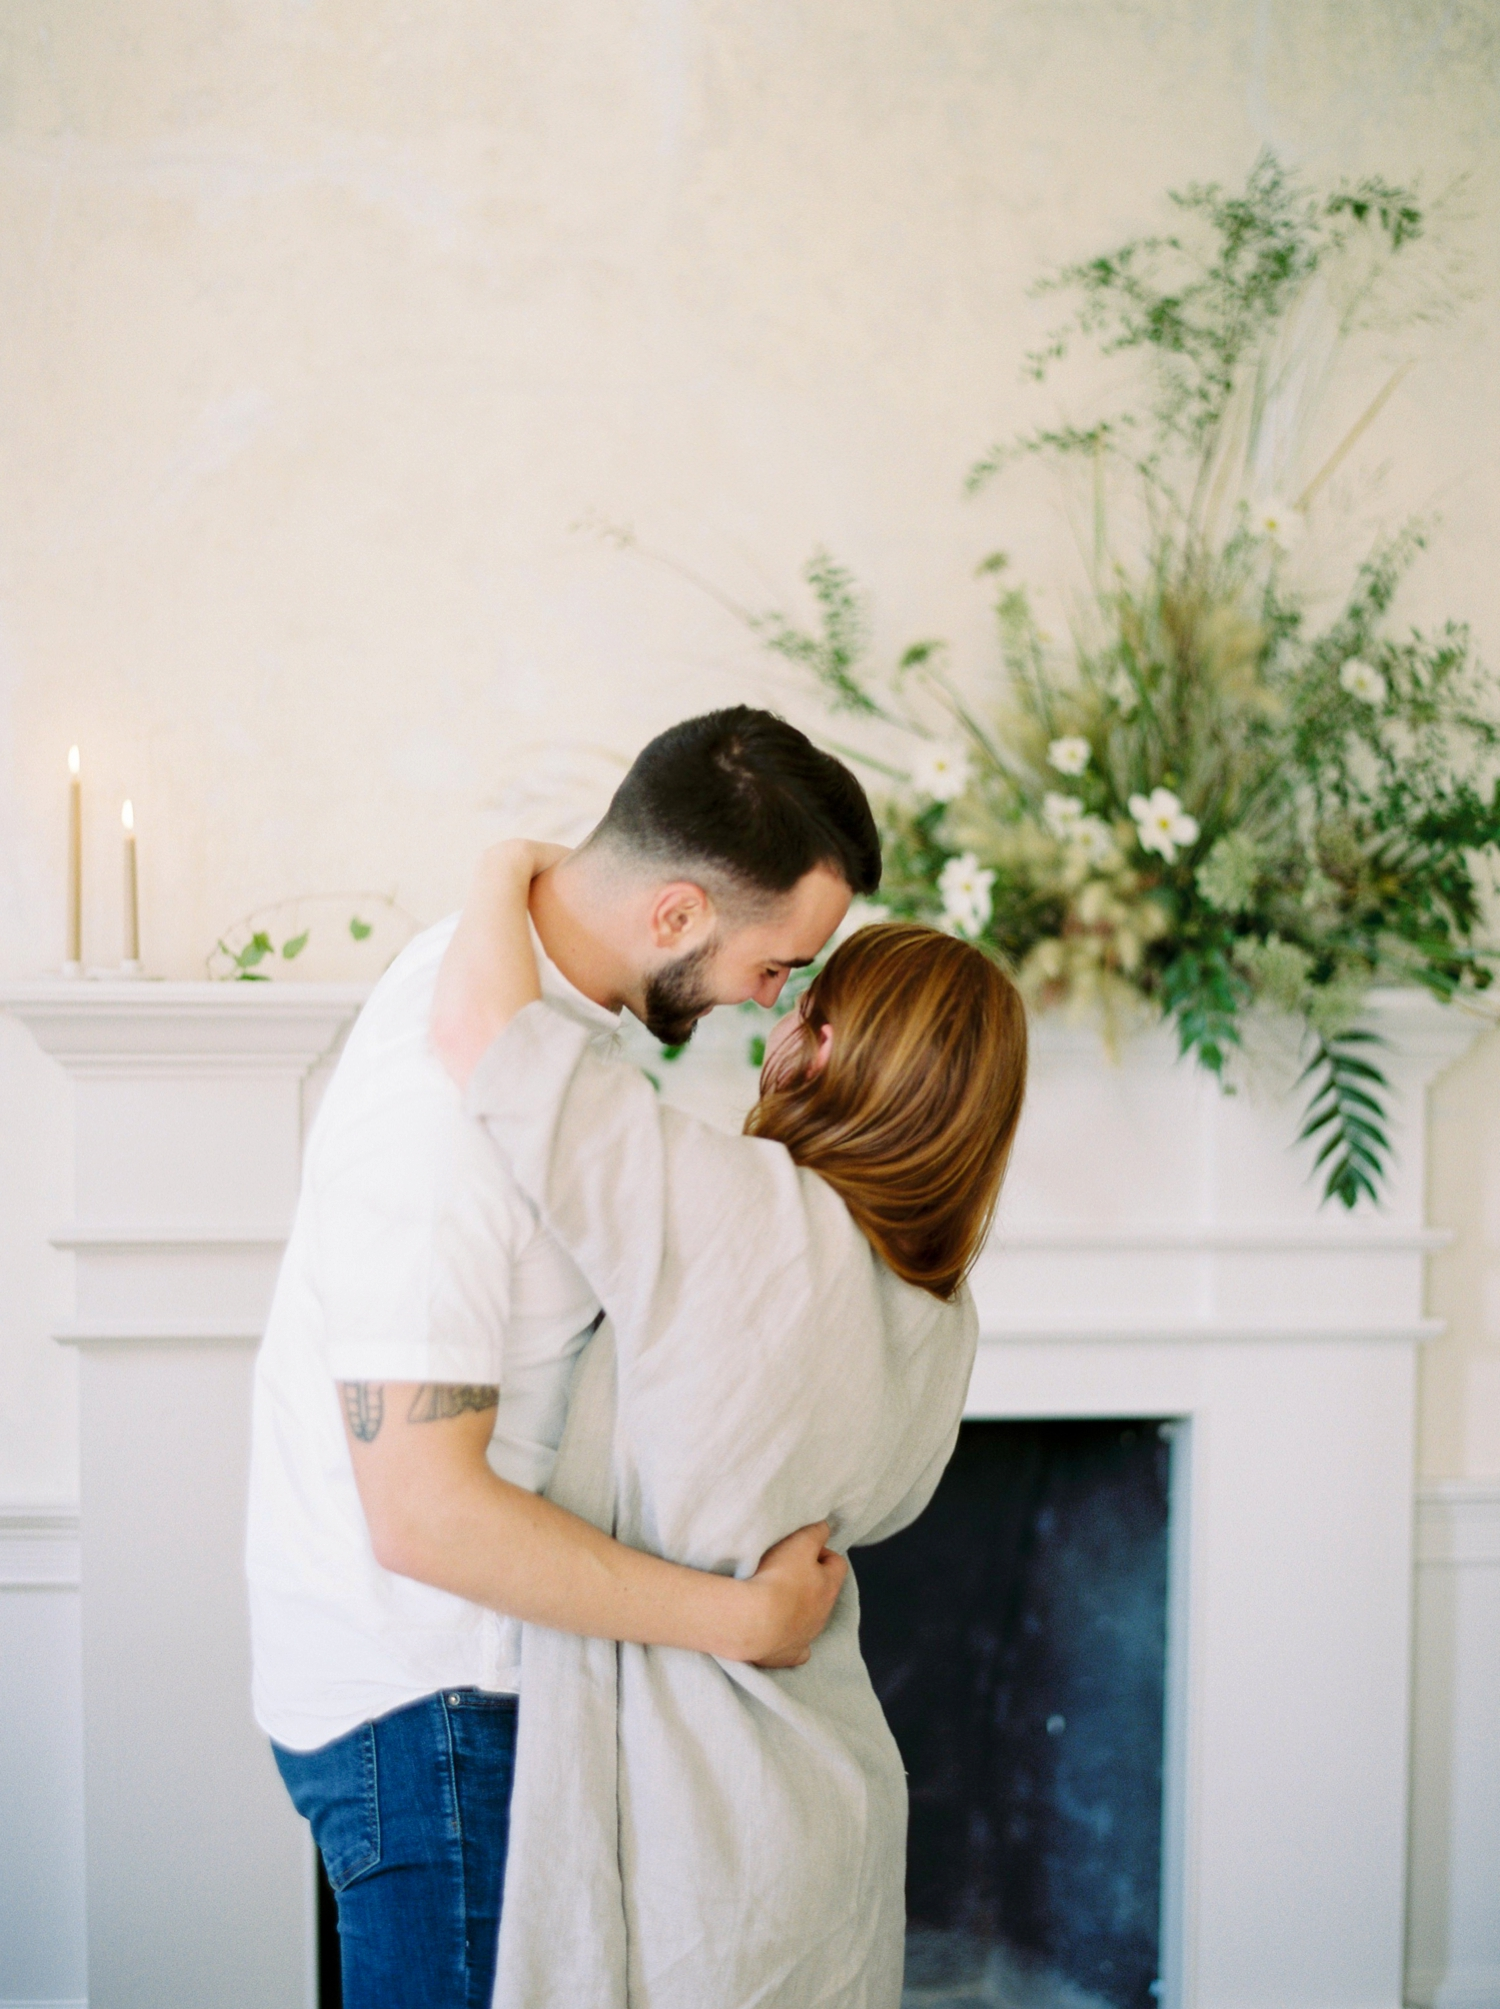 Charleston wedding photographer | anniversary session | fine art film photography | Calgary Wedding Photographers | Calgary couples photographer | Justine Milton Photography | couples photography |